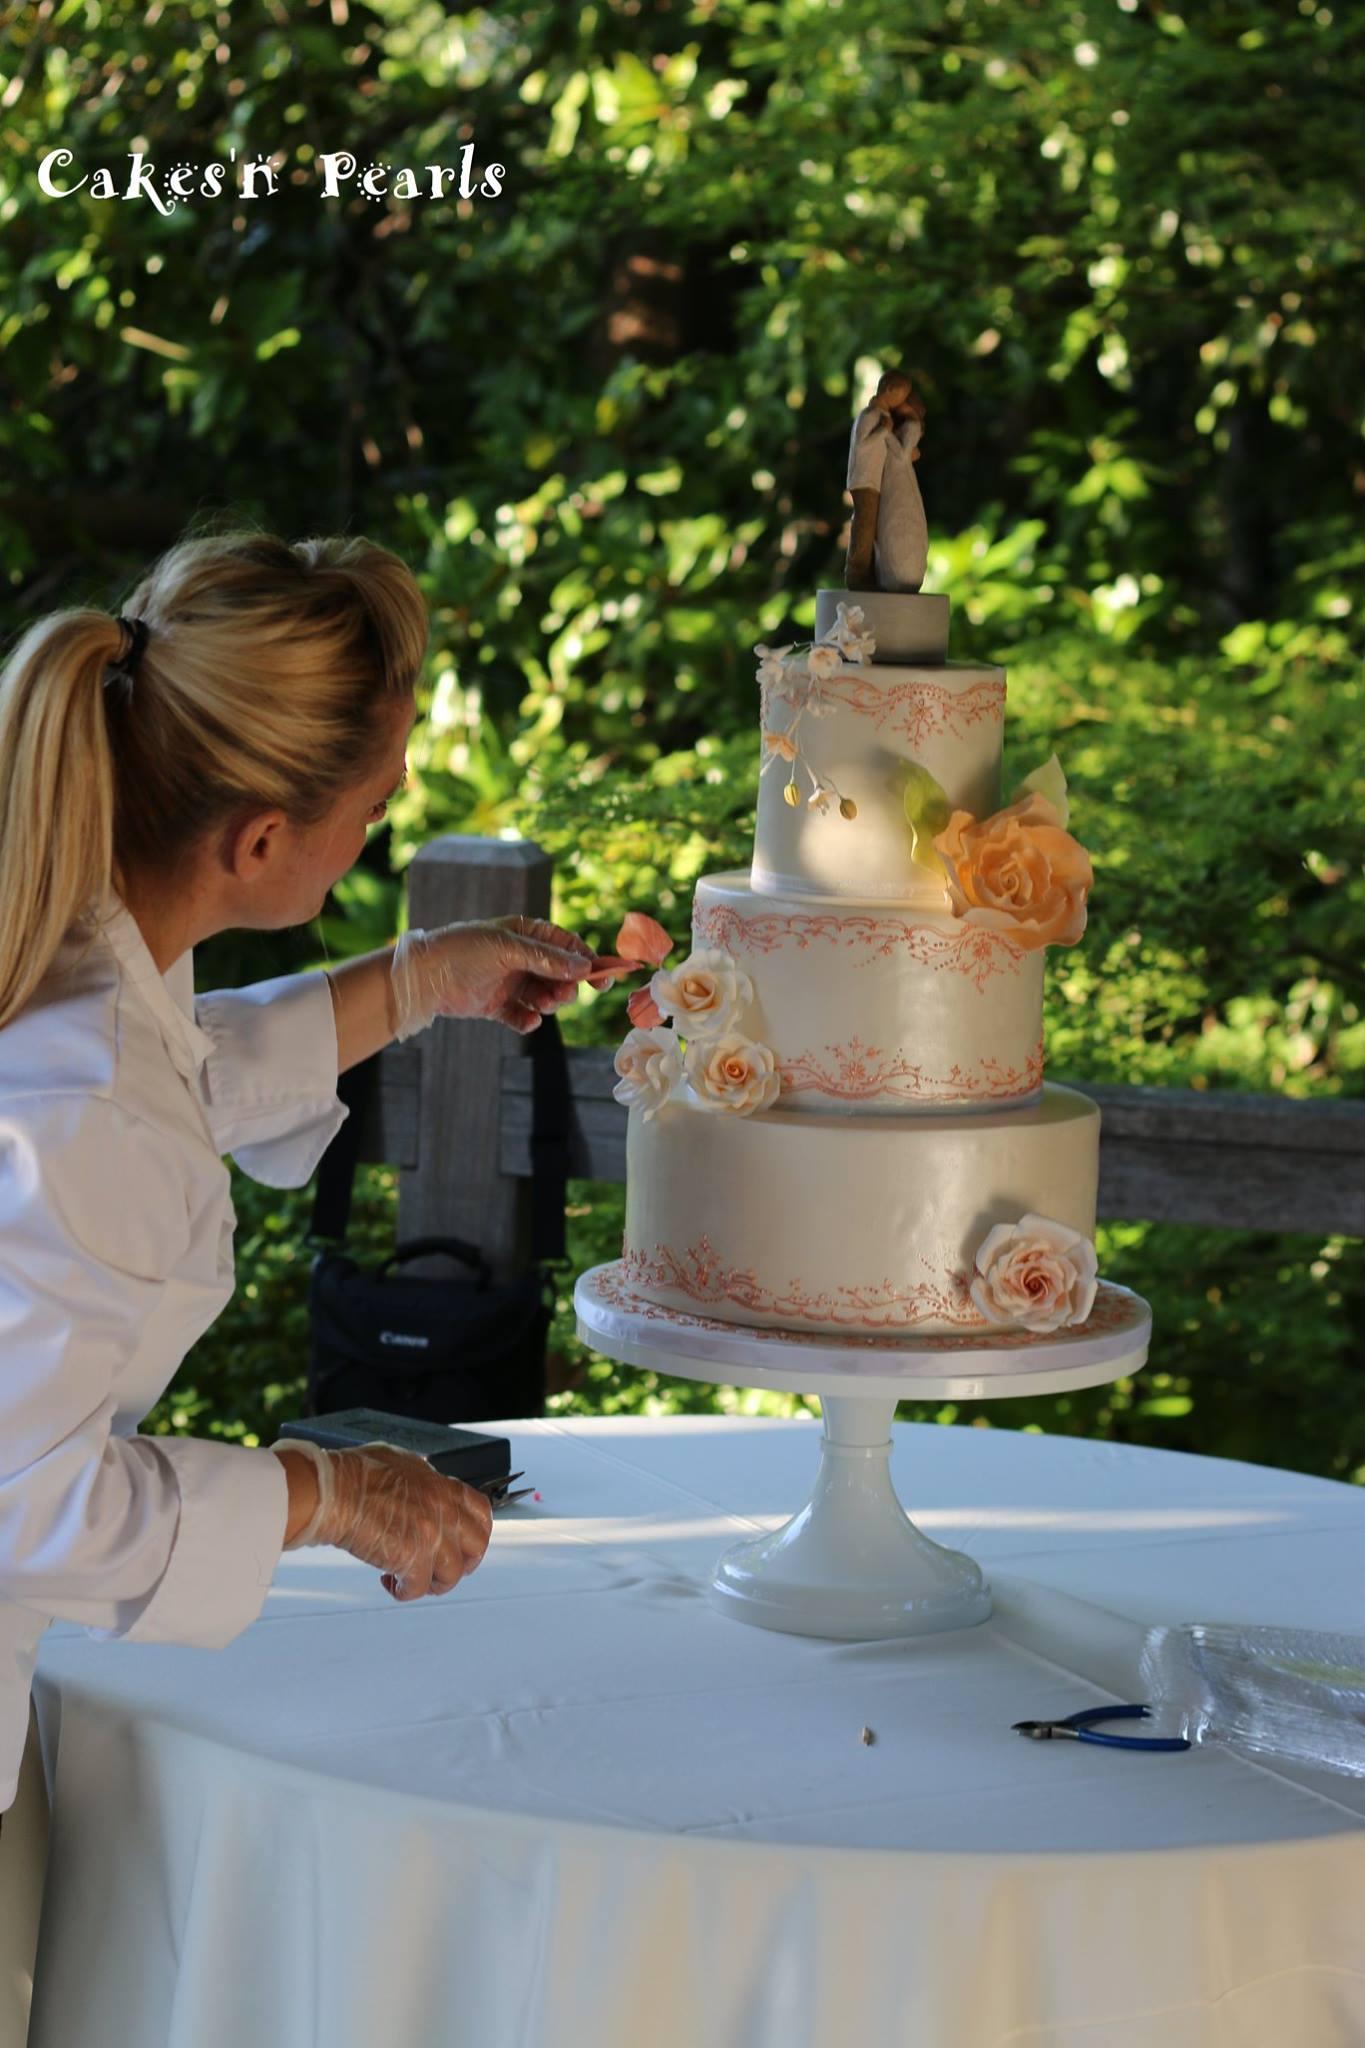 Wedding Cakes Dallas Fort Worth Cakesu0027n Pearls In Roanoke Texas